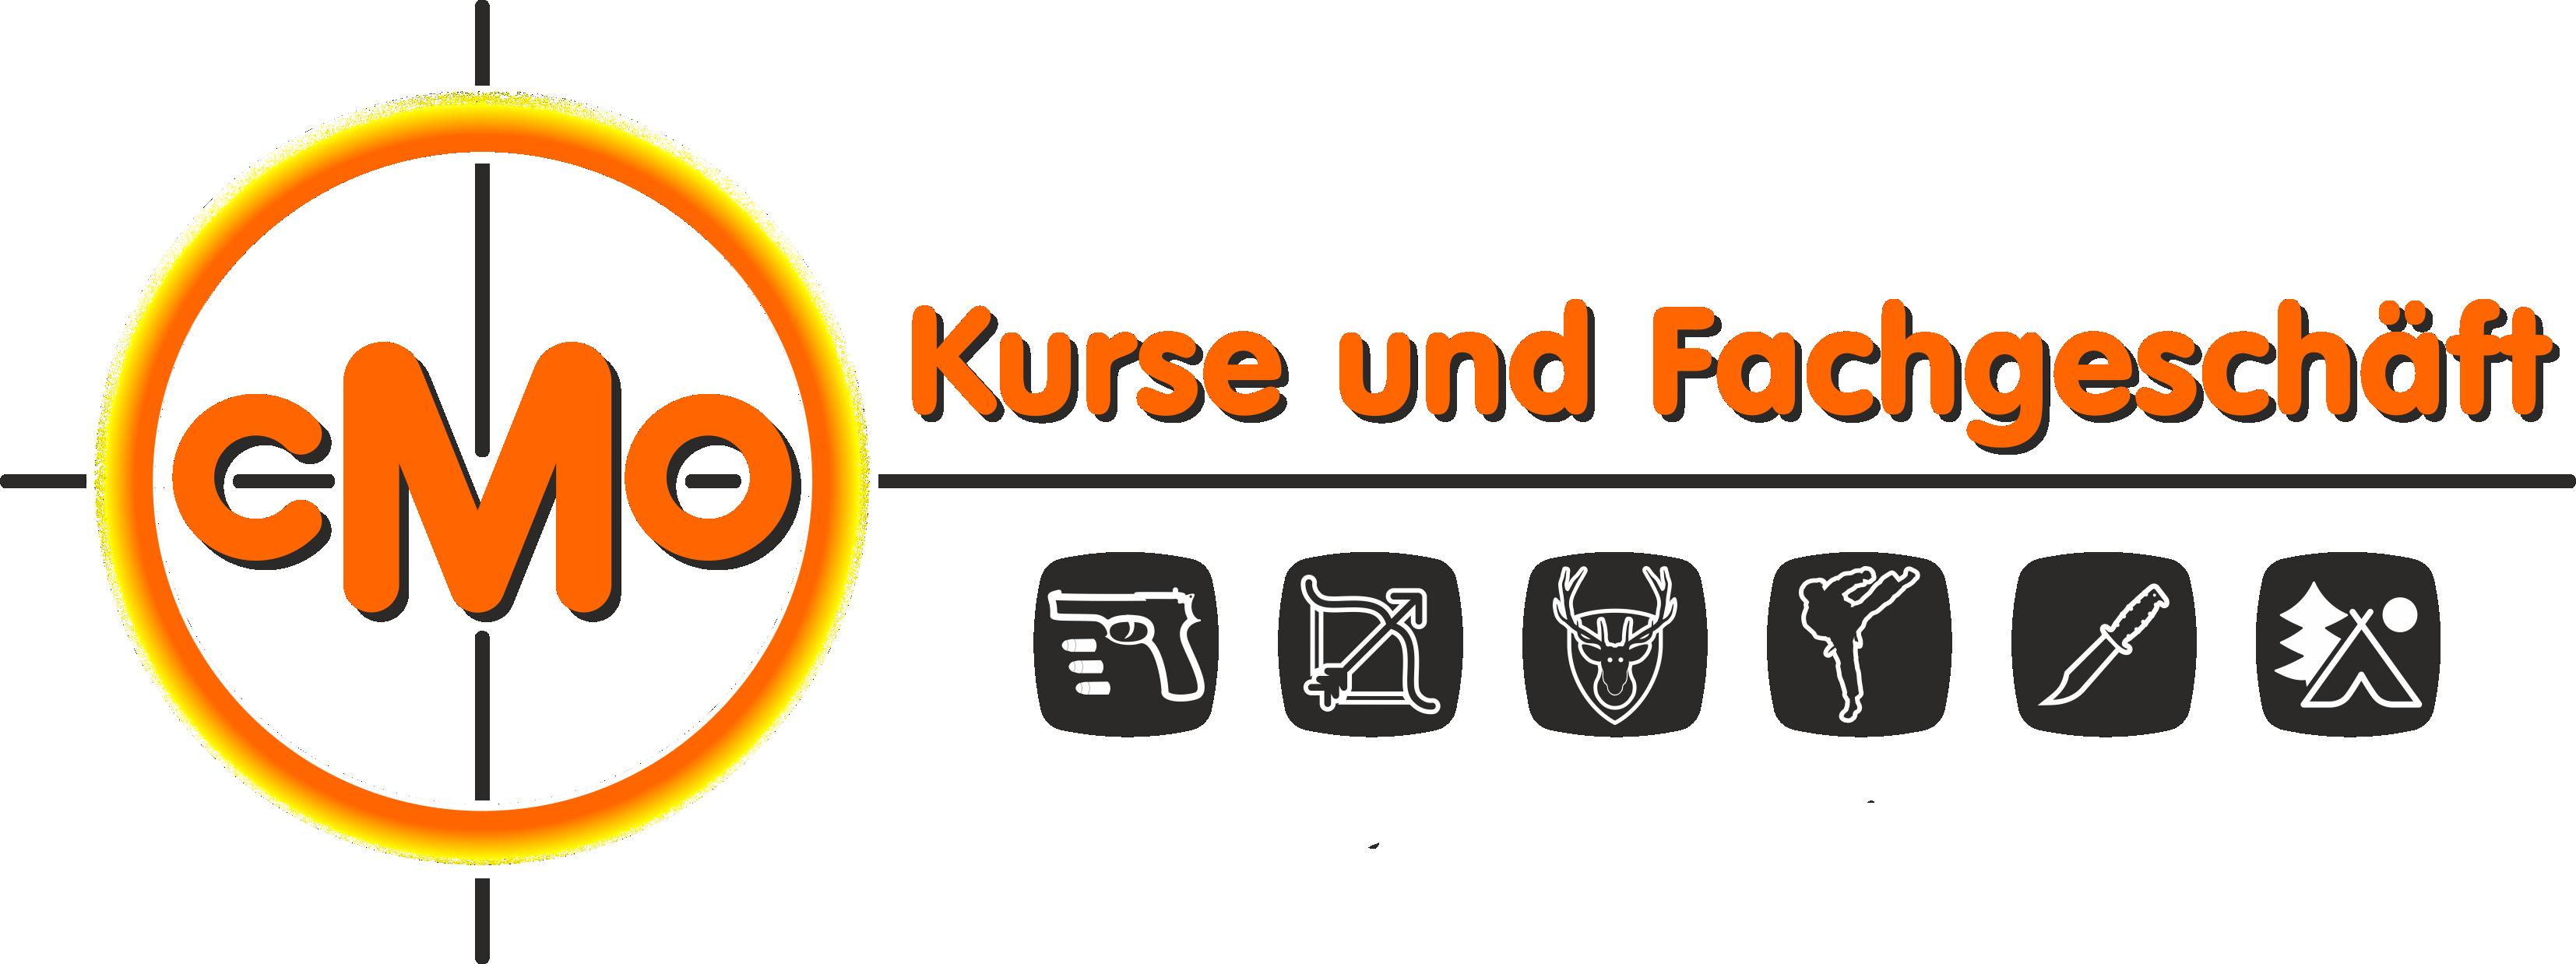 CMO - Kurse und Fachgeschäft Logo